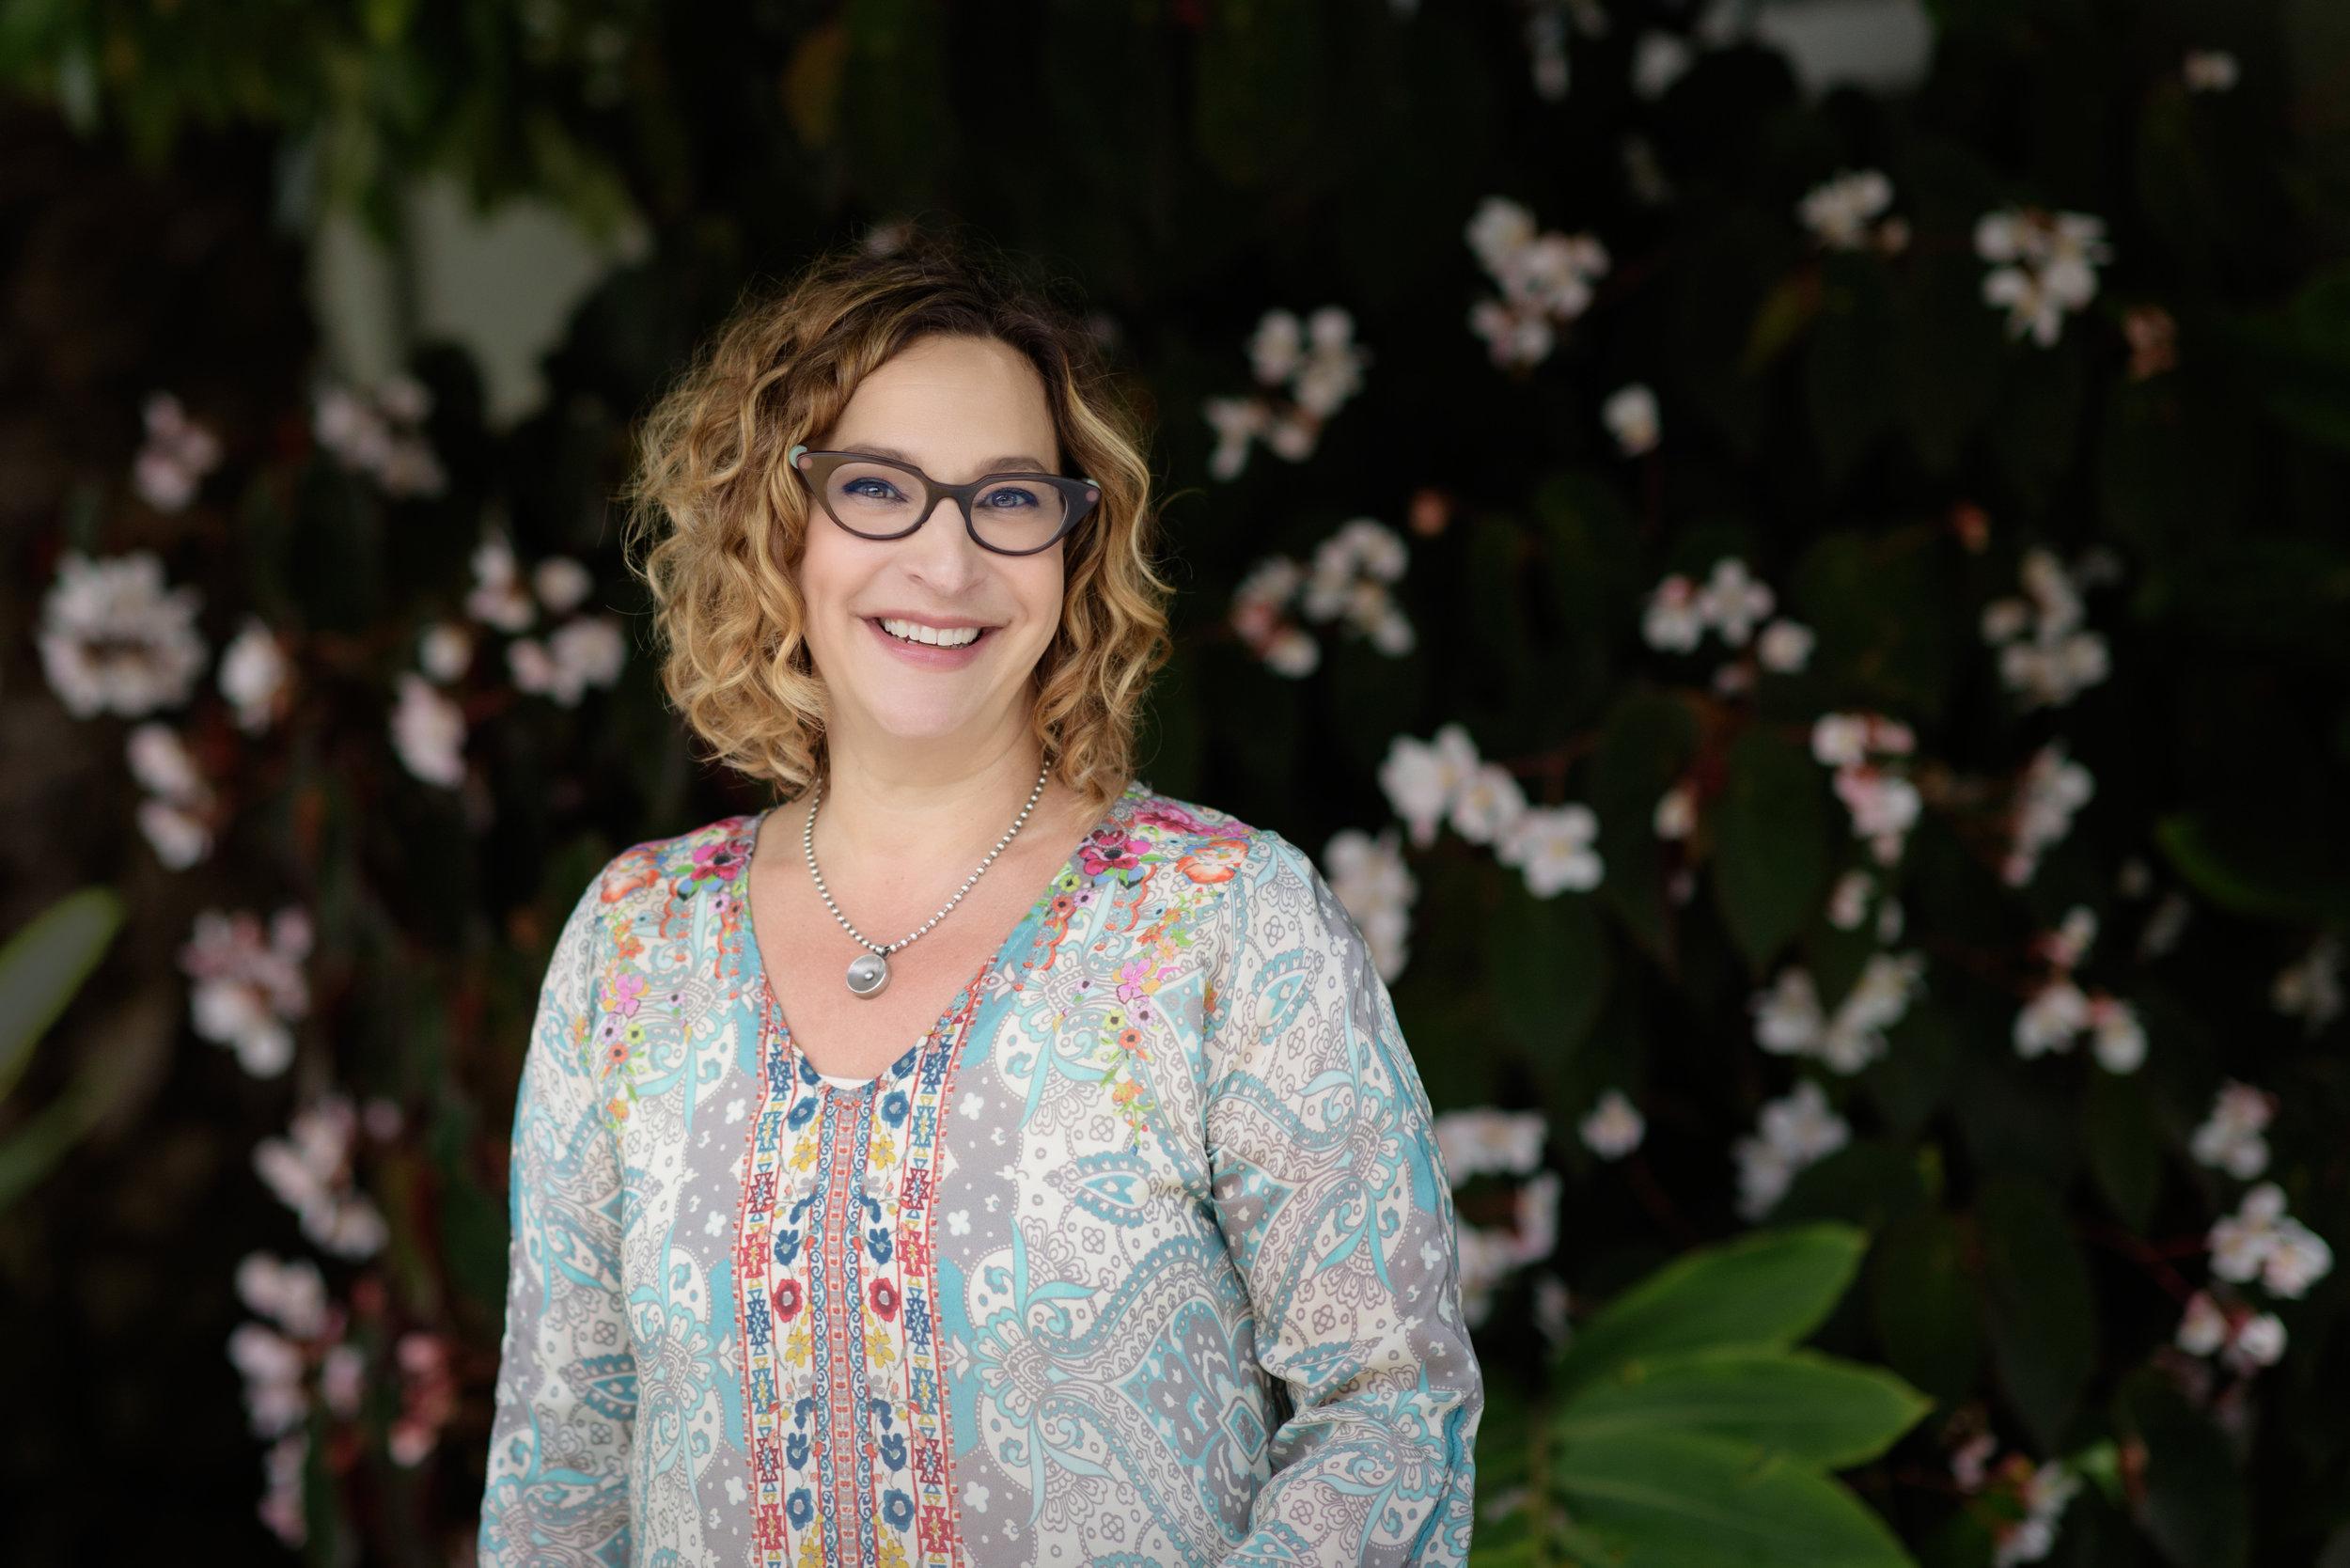 San Francisco personal branding photographer Nina Pomeroy